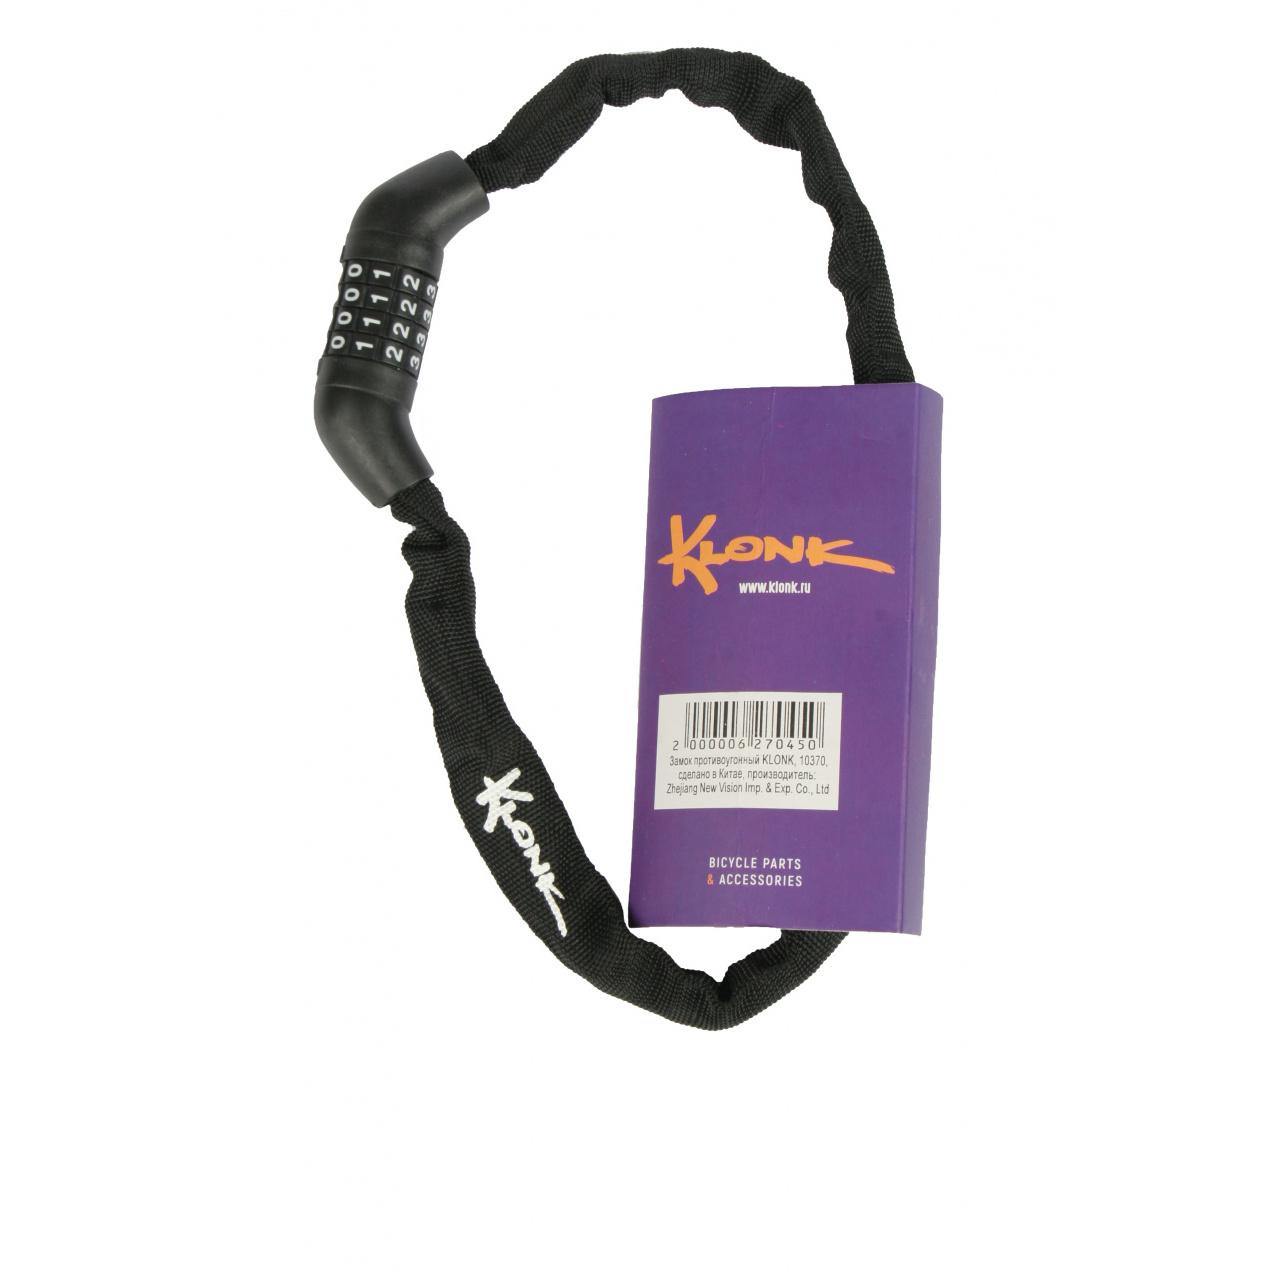 Велозамок Klonk 4x650мм цепь с кодом (10370)